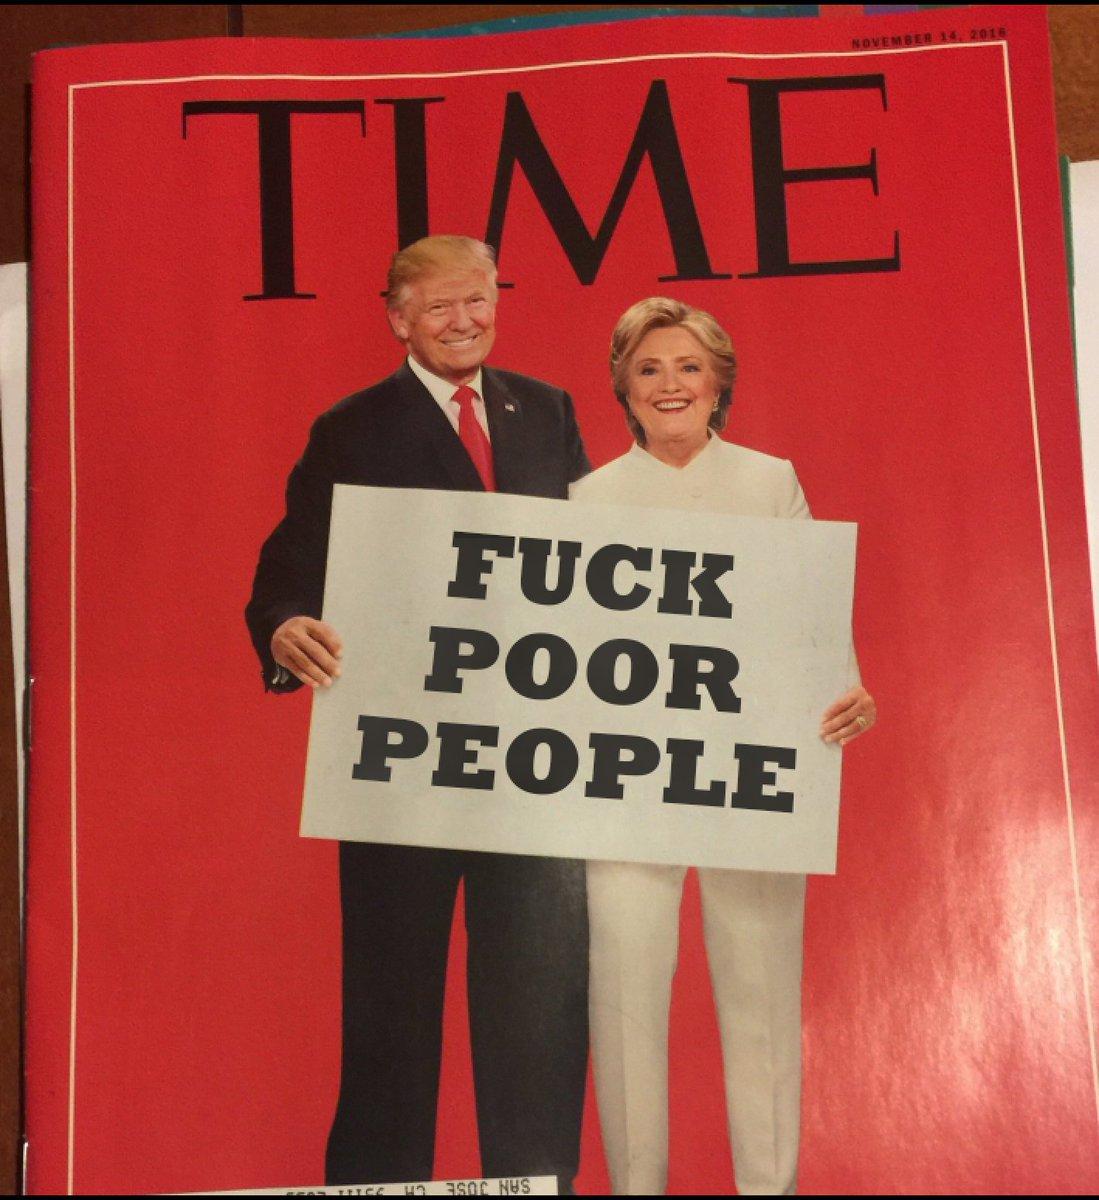 #2016election #TrumpPence16 #ClintonKaine2016 https://t.co/aEzTljv3IR